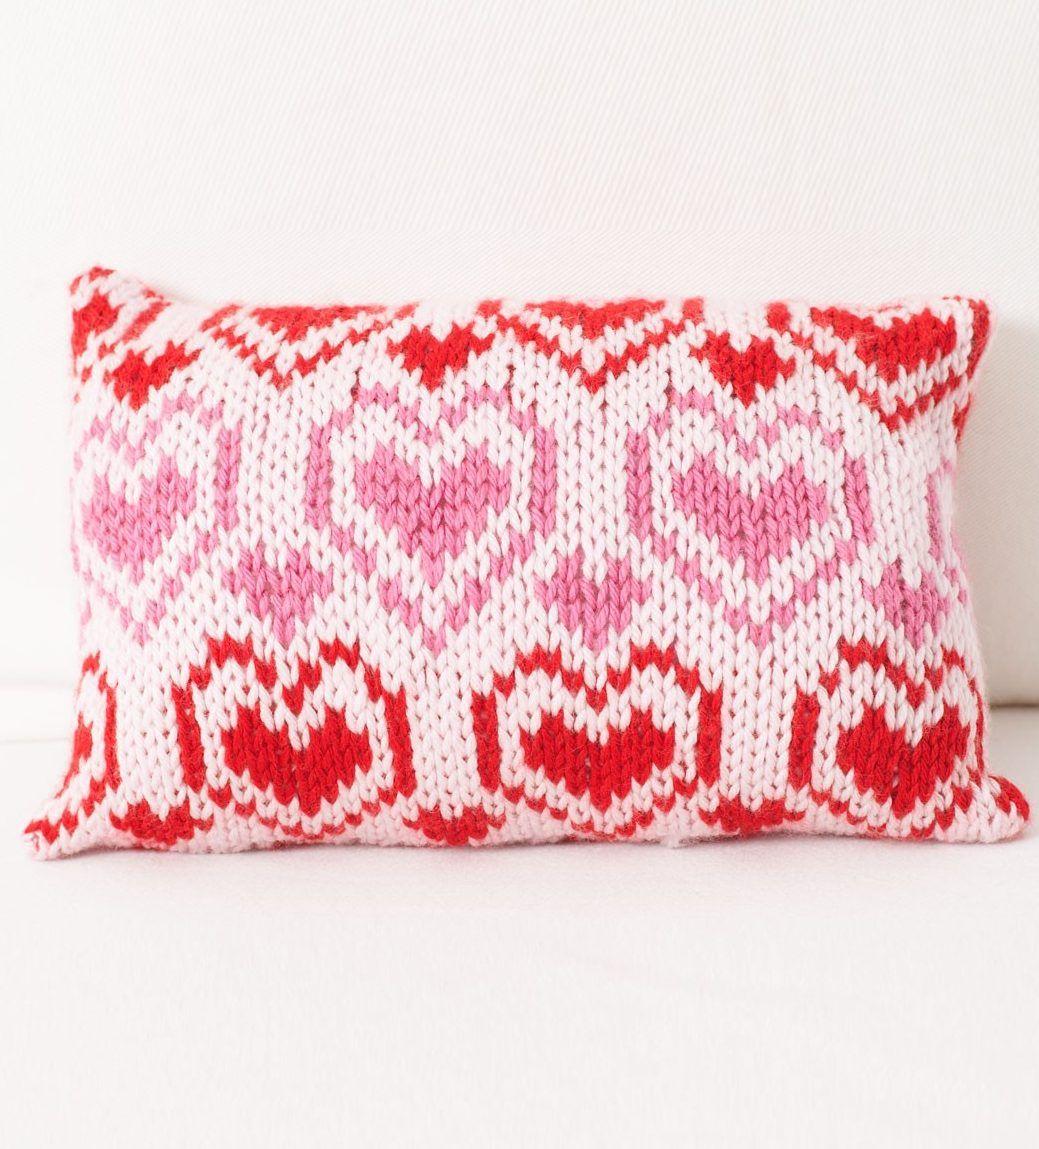 Heart Knitting Patterns Heart Knitting Patterns